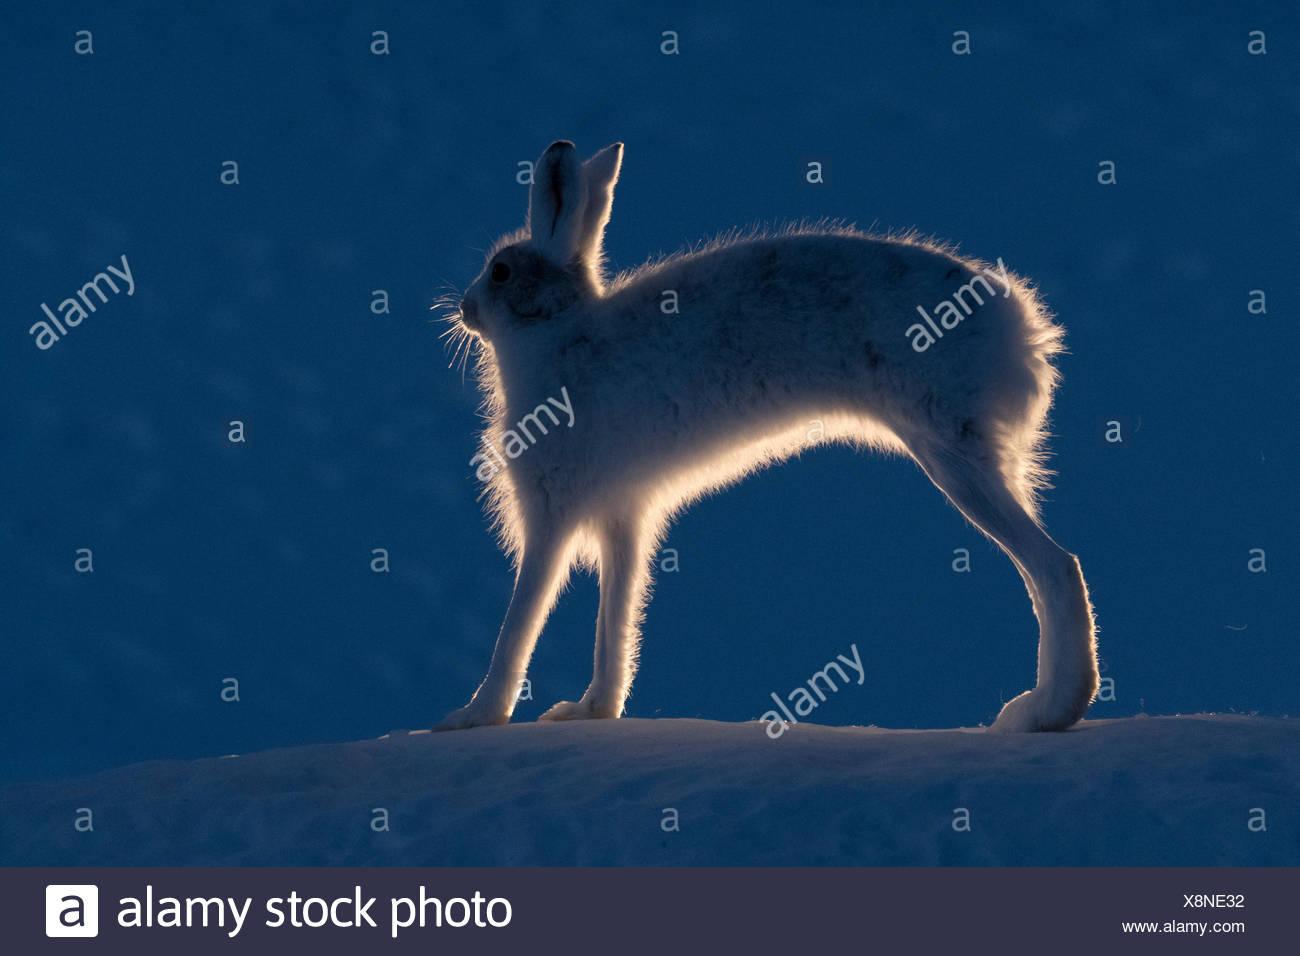 Berg hase Lepus timidus, Stretching, seine Beine. Stockbild